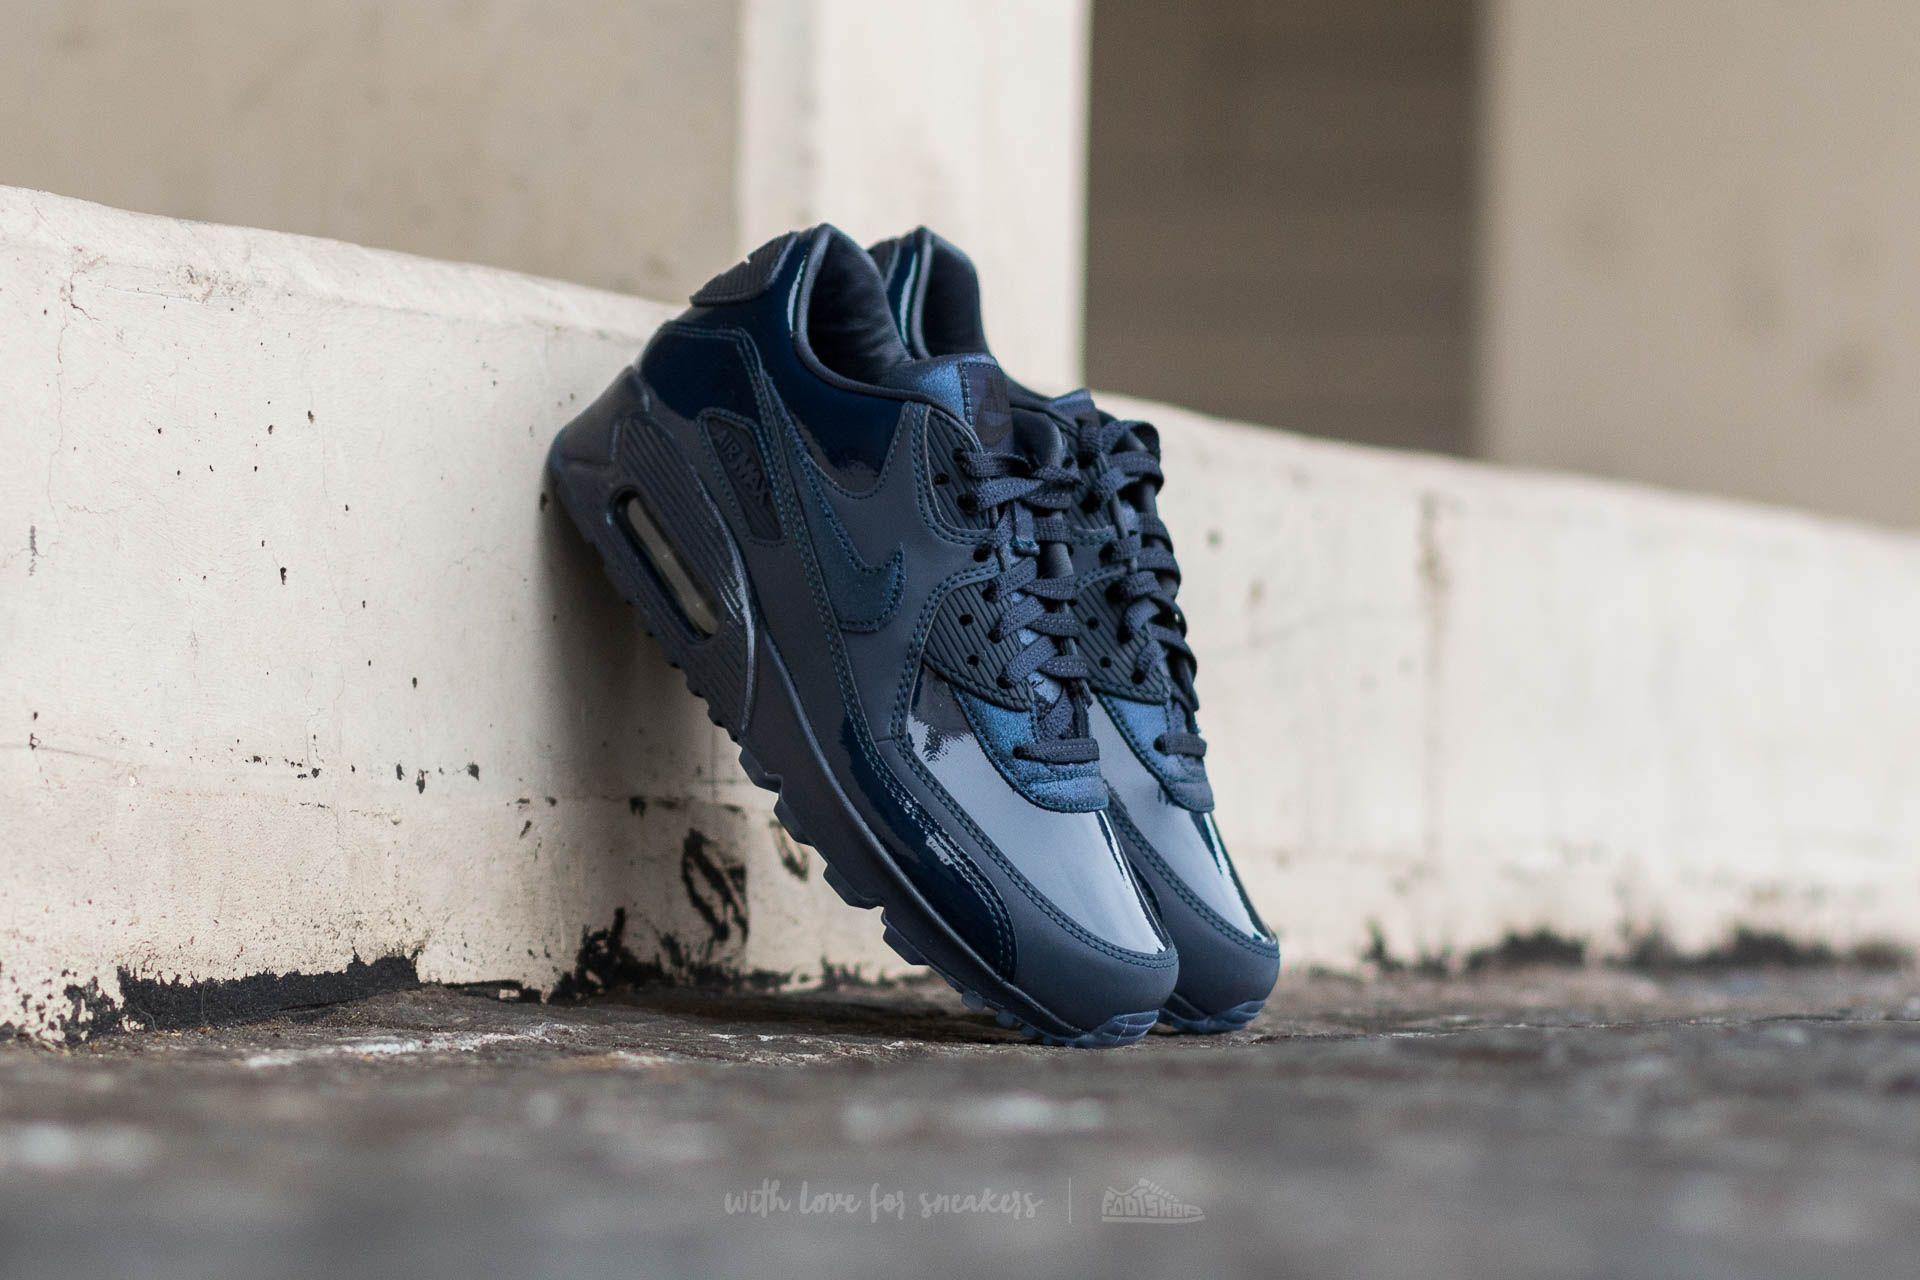 Nike Wmns Air Max 90 Pedro Lourenco Obsidian Obsidian | Footshop